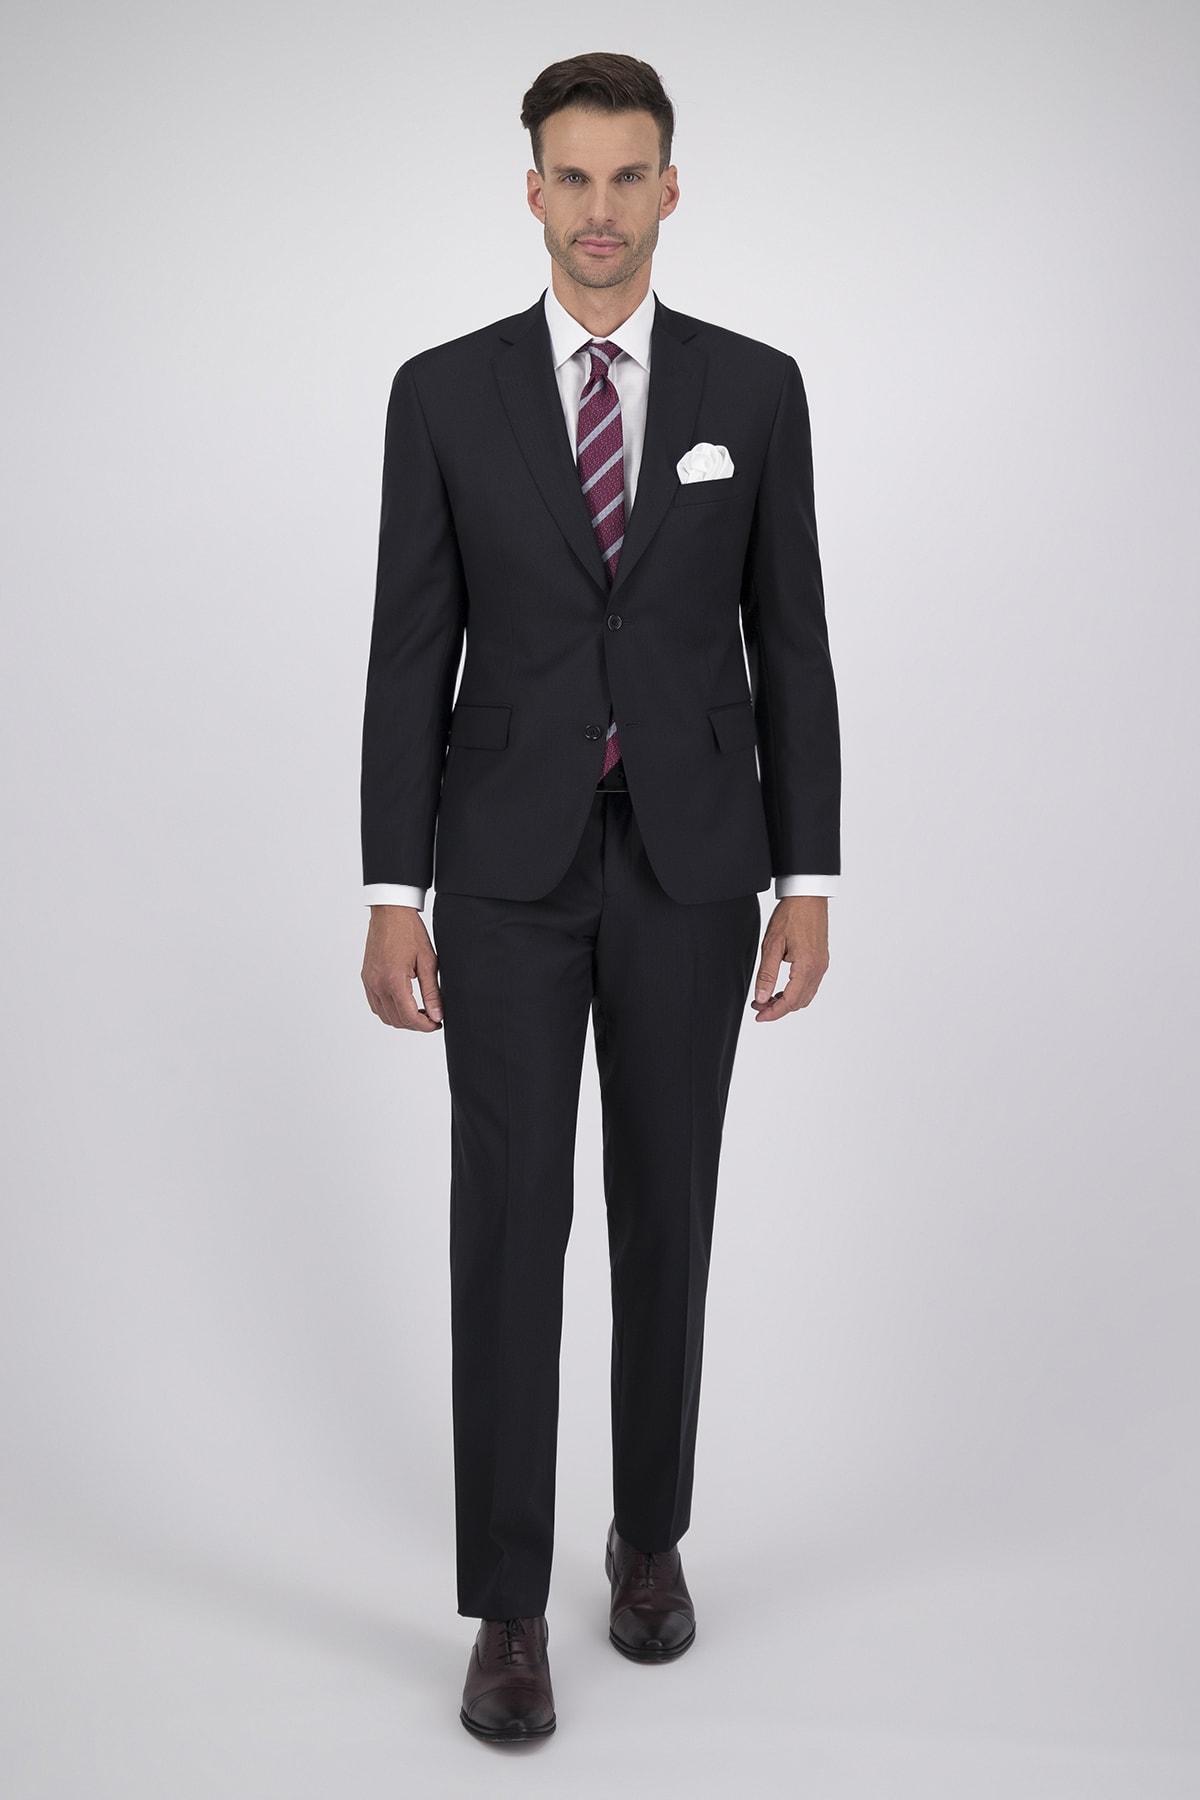 Traje corte Regular tejido Cloth Ermenegildo Zegna negro